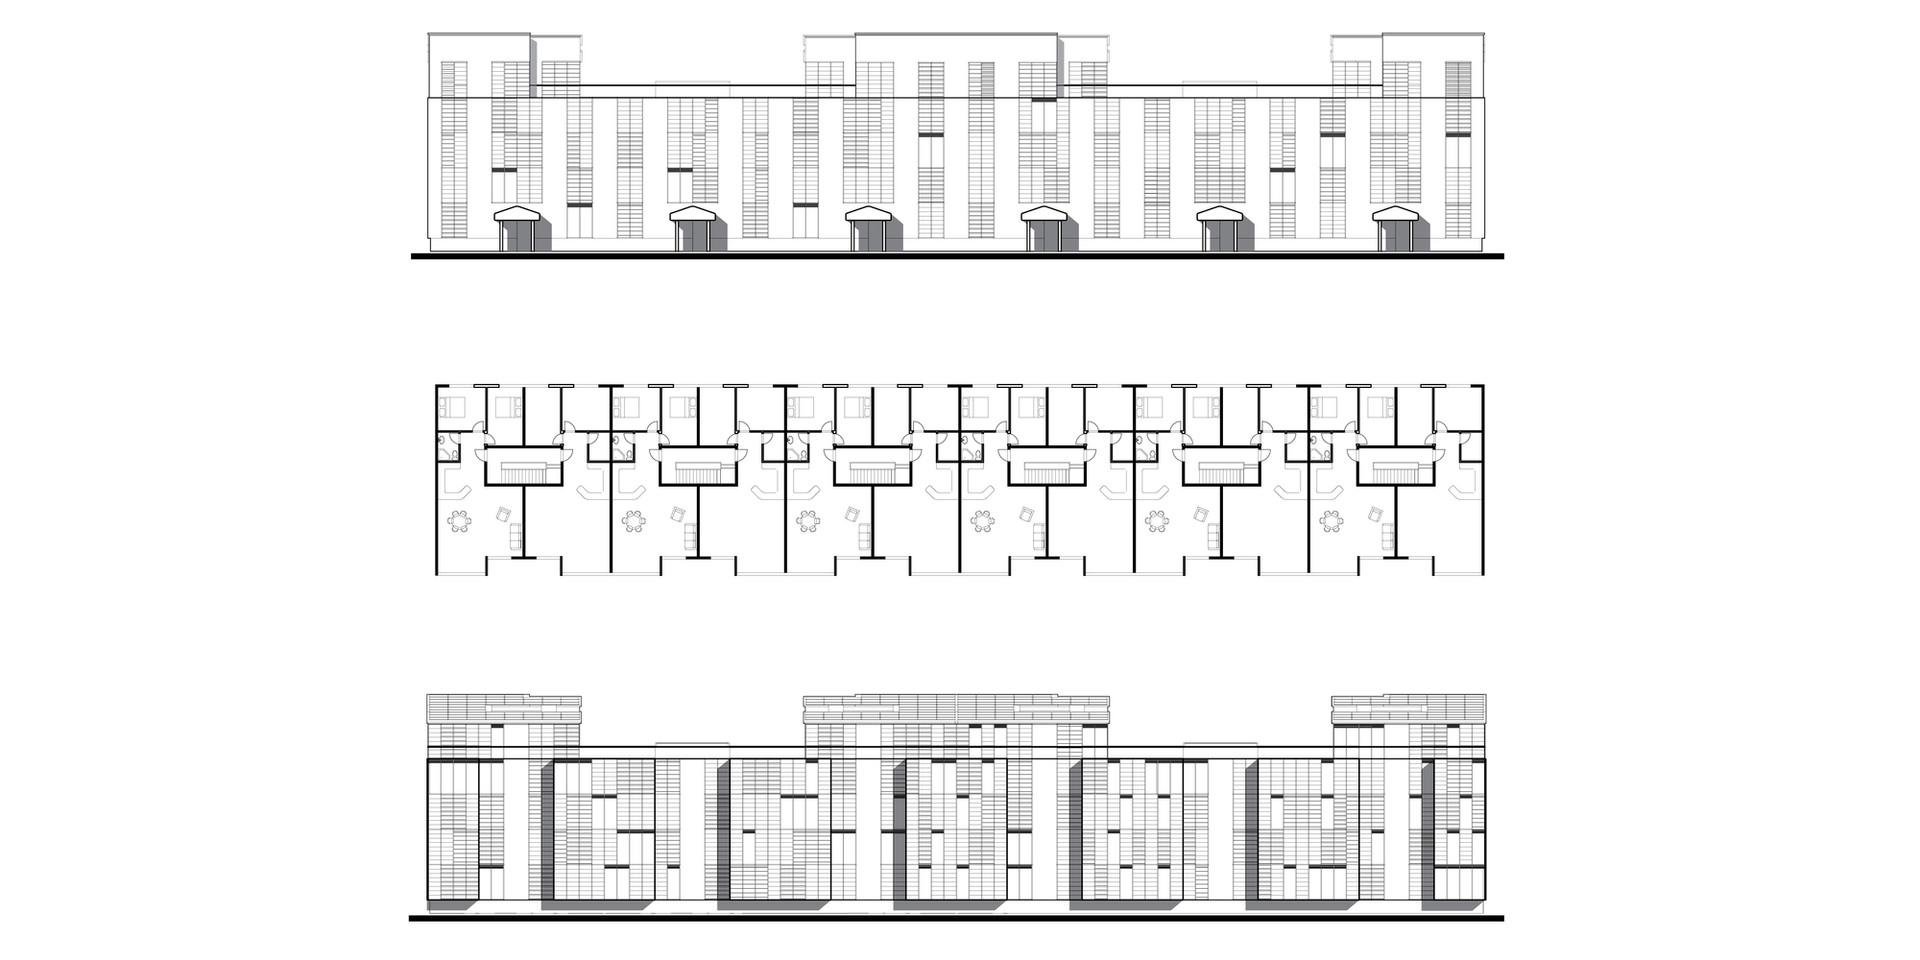 Ellebo Housing Renovation Block #1 Drawings